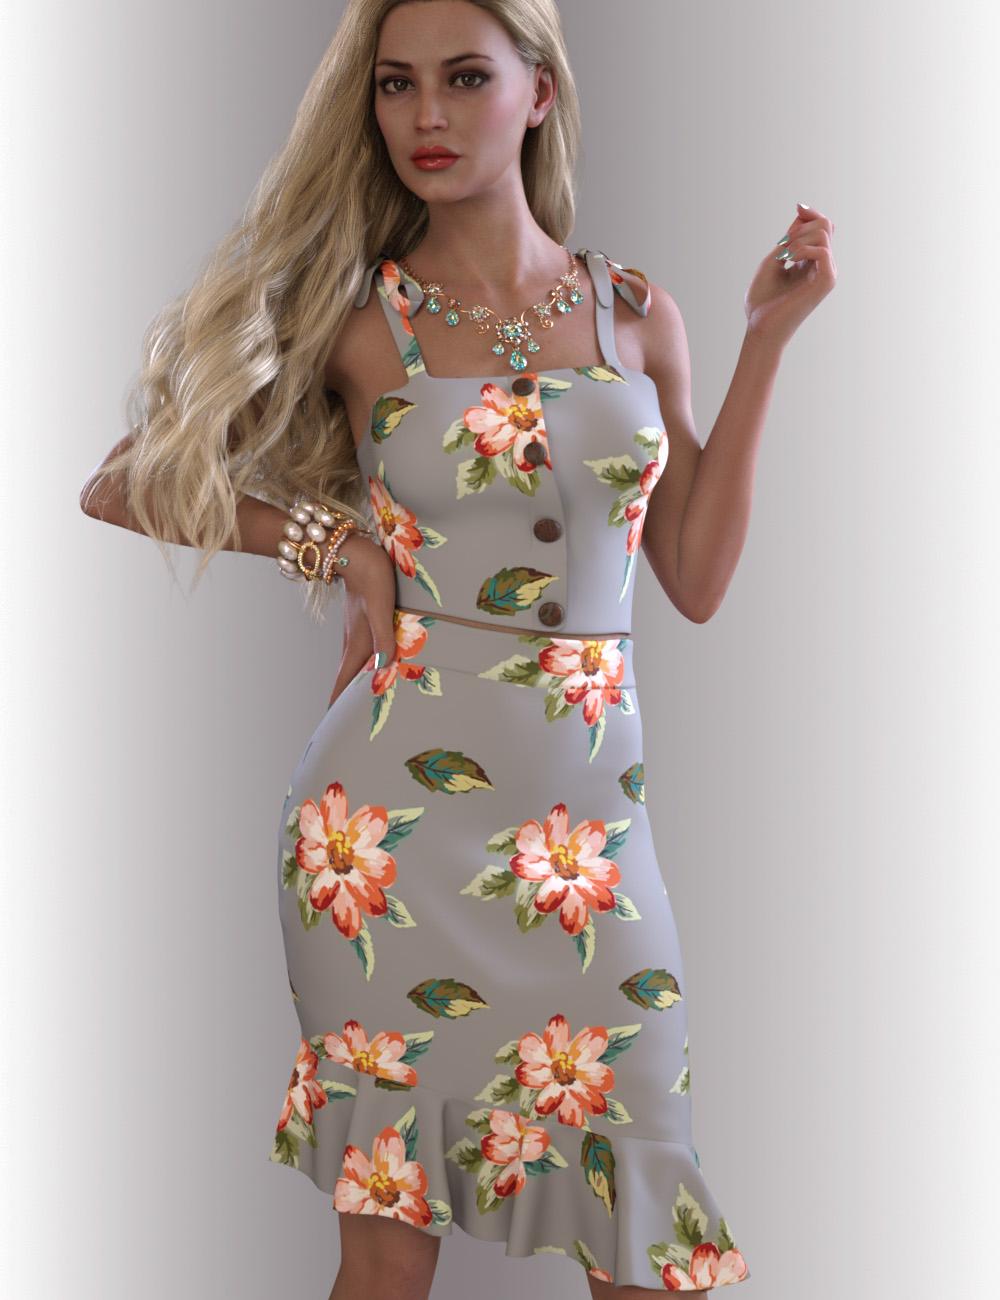 dForce Reina Outfit for Genesis 8.1 Females by: OnnelArryn, 3D Models by Daz 3D